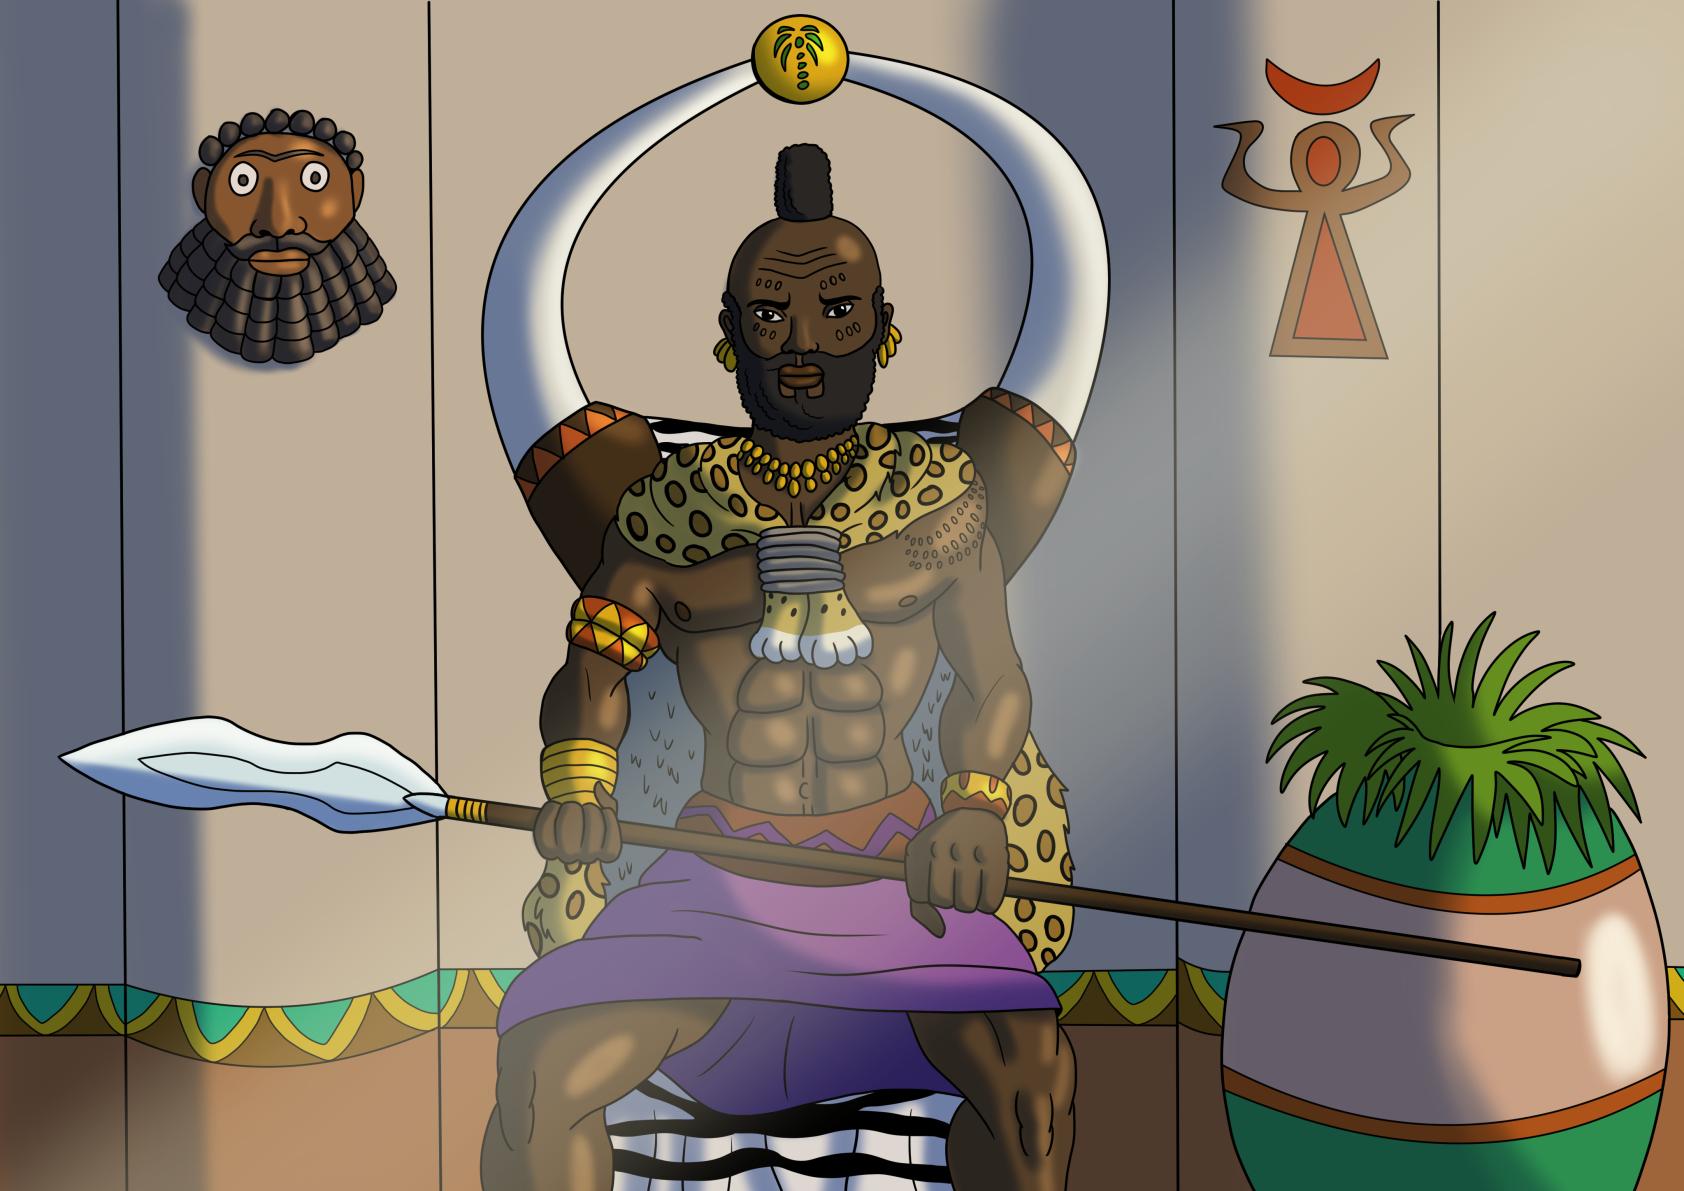 Hannibal Barca of Carthage (Art)